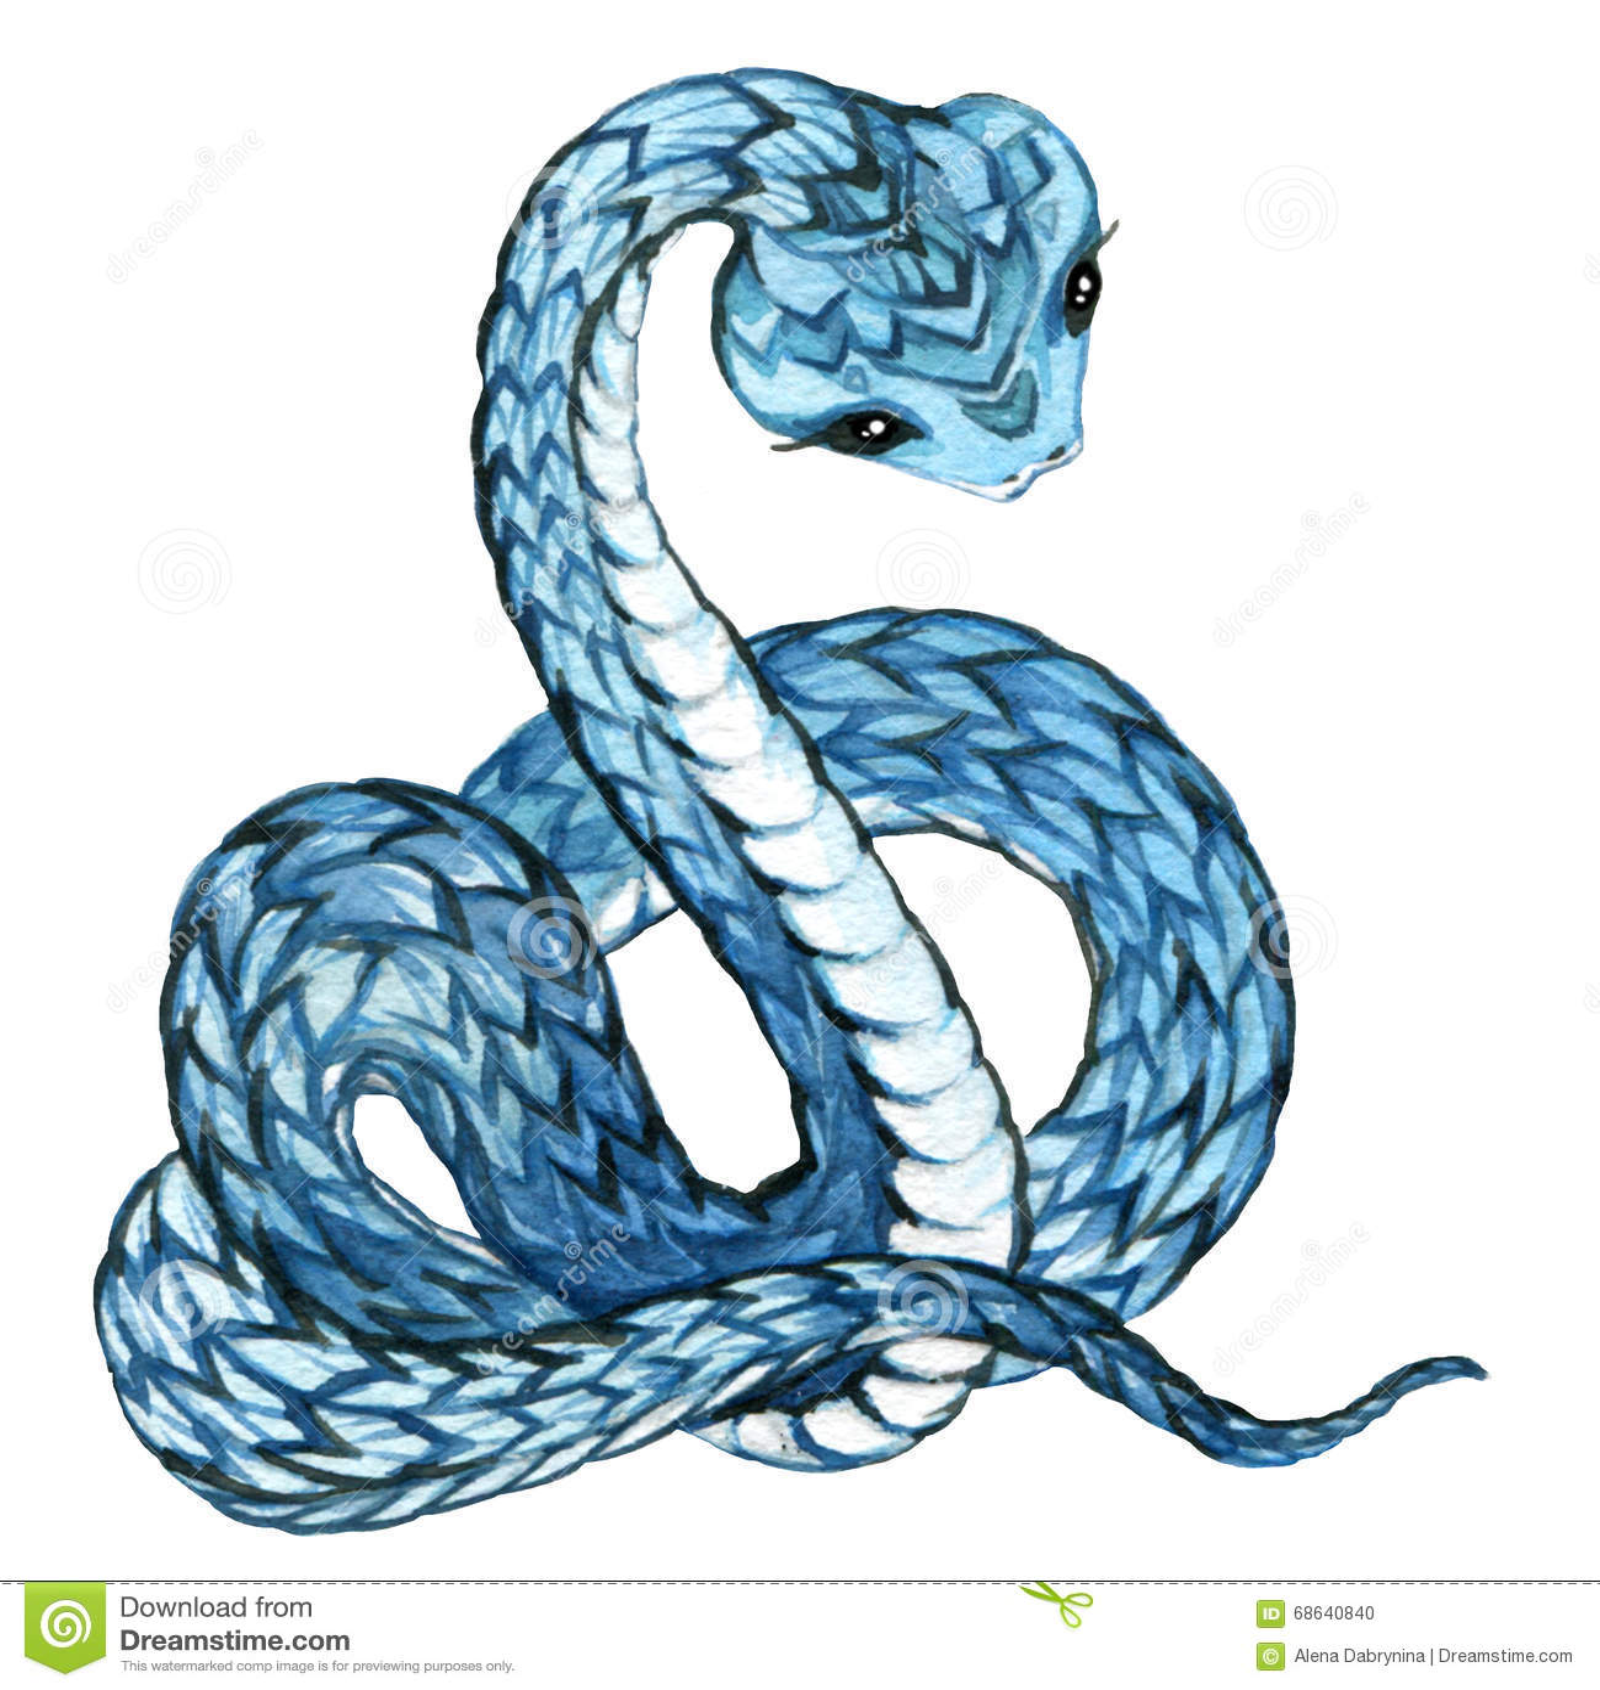 Green snake cartoon royalty free stock image image 19462406 - Serpent Aquarelle De Serpent Photo Stock